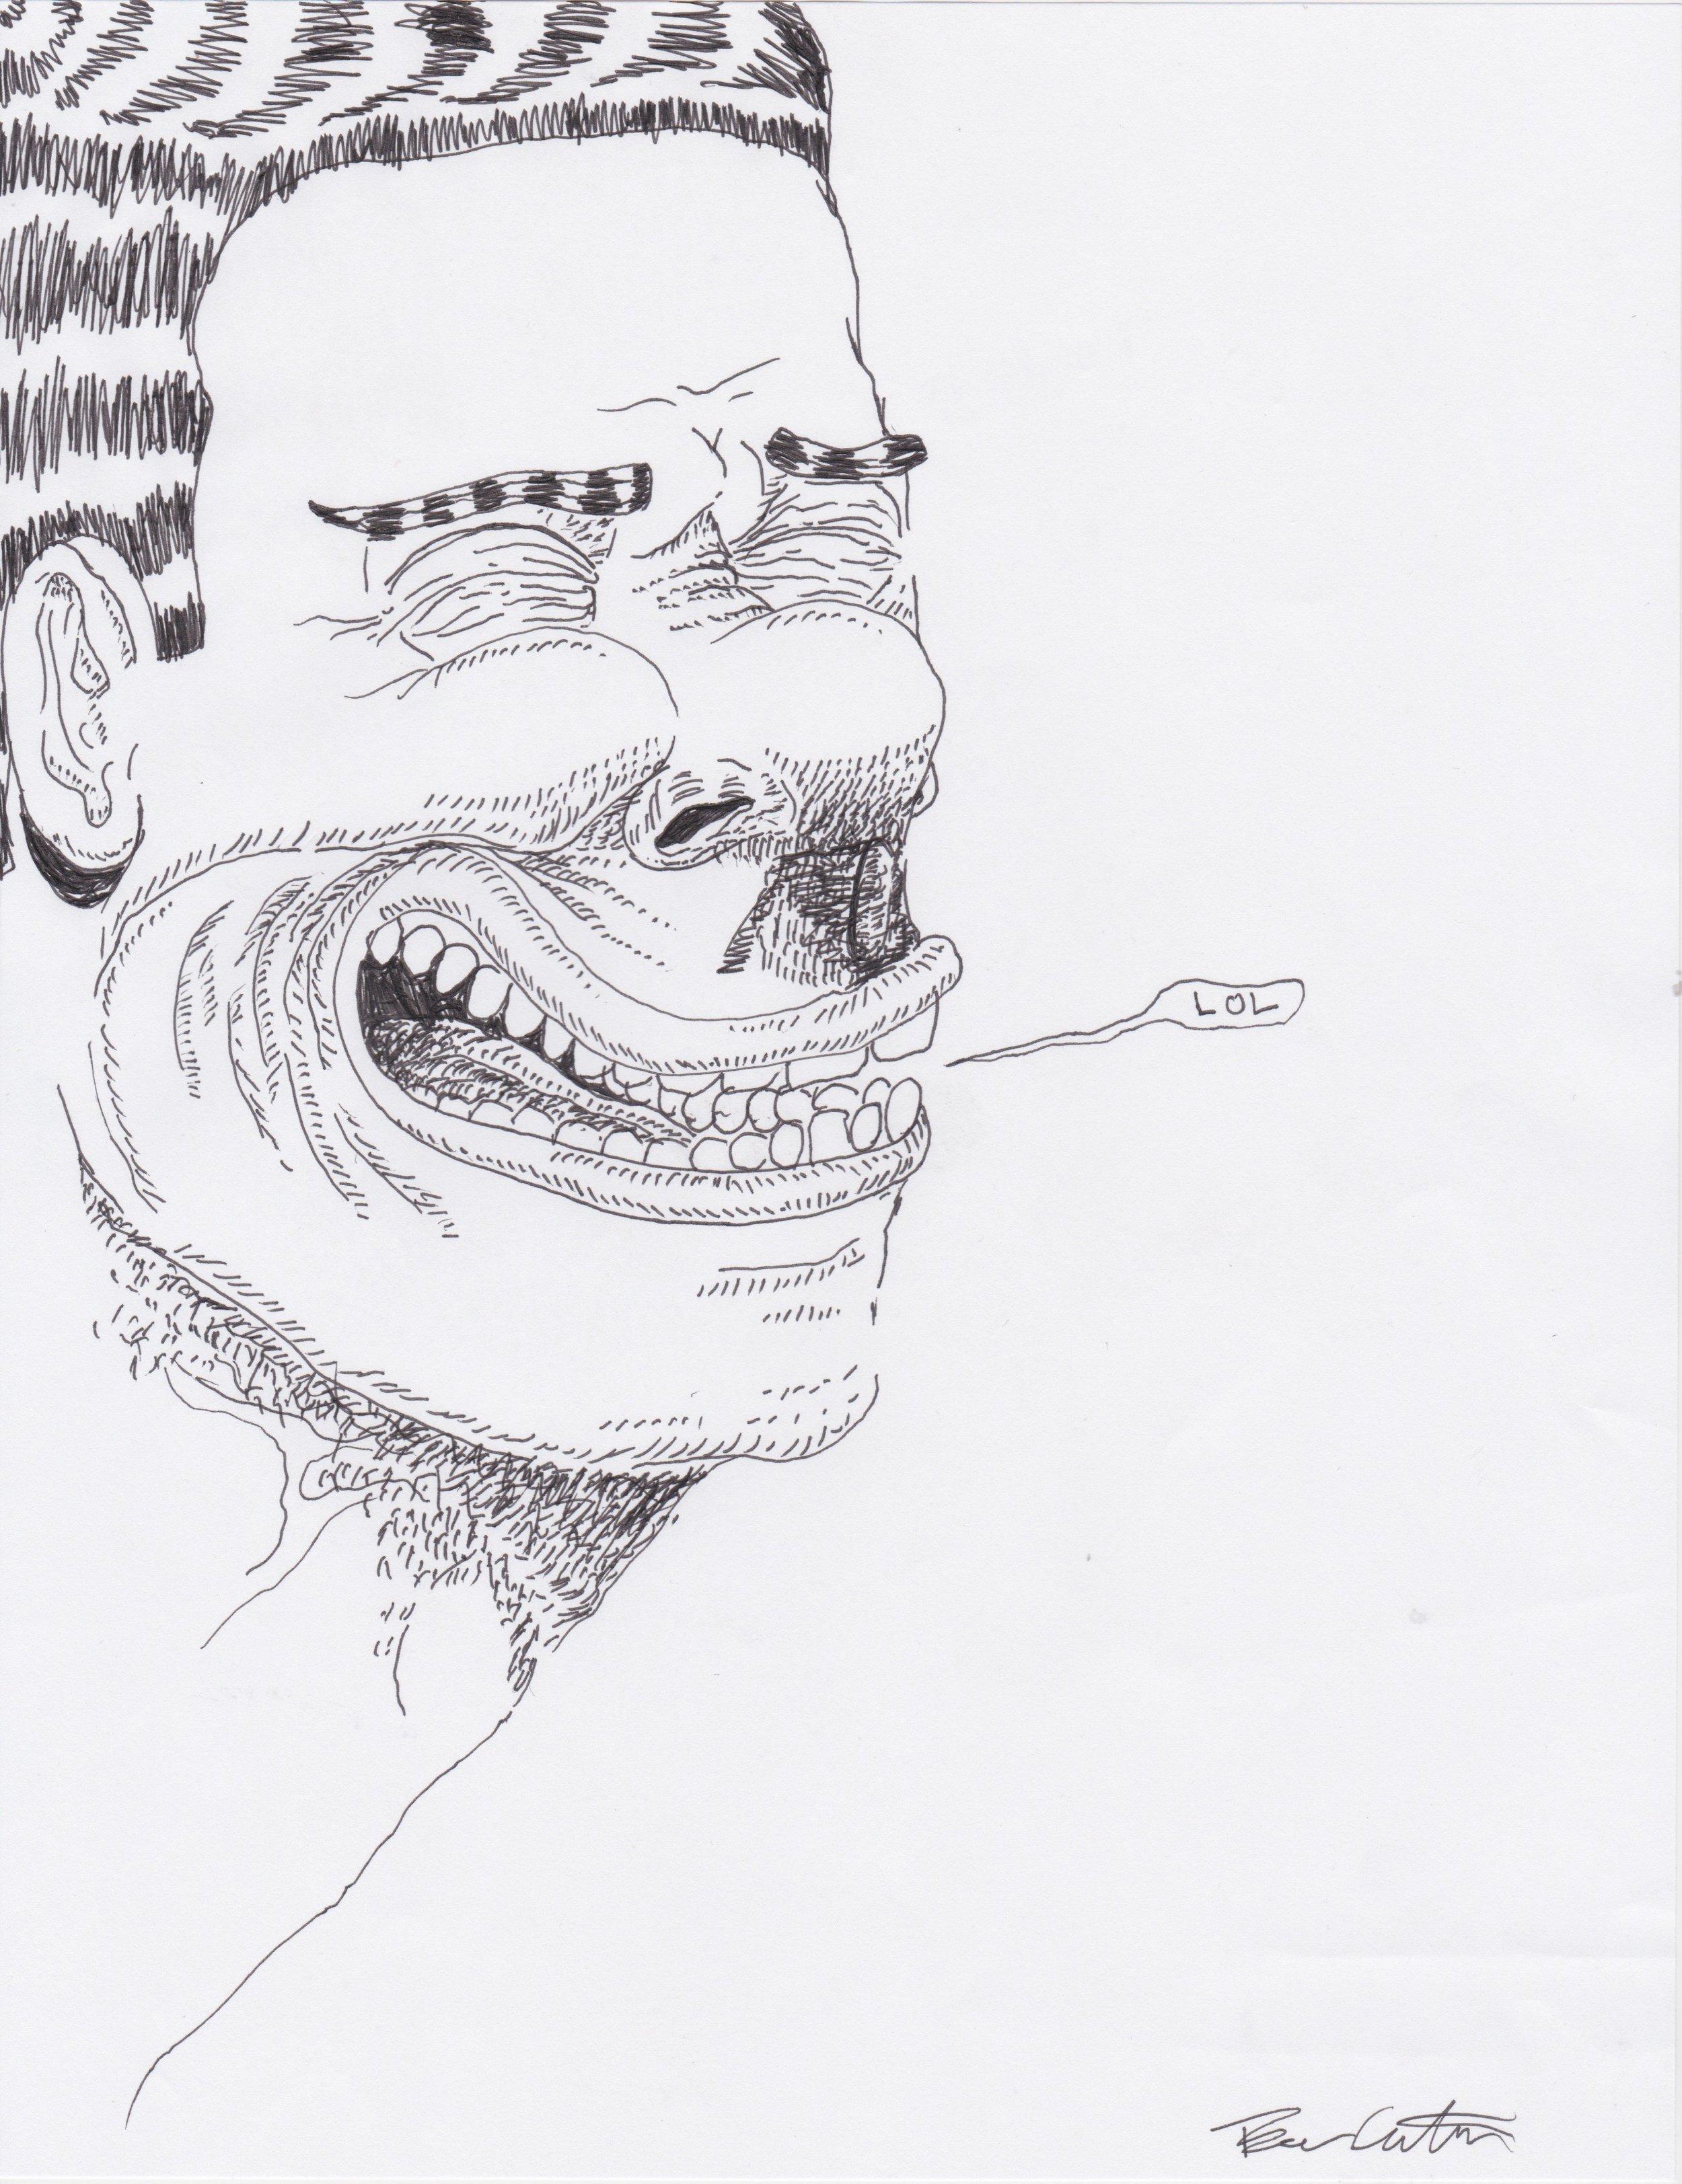 Illustration by Ben Guterl, Guitarist